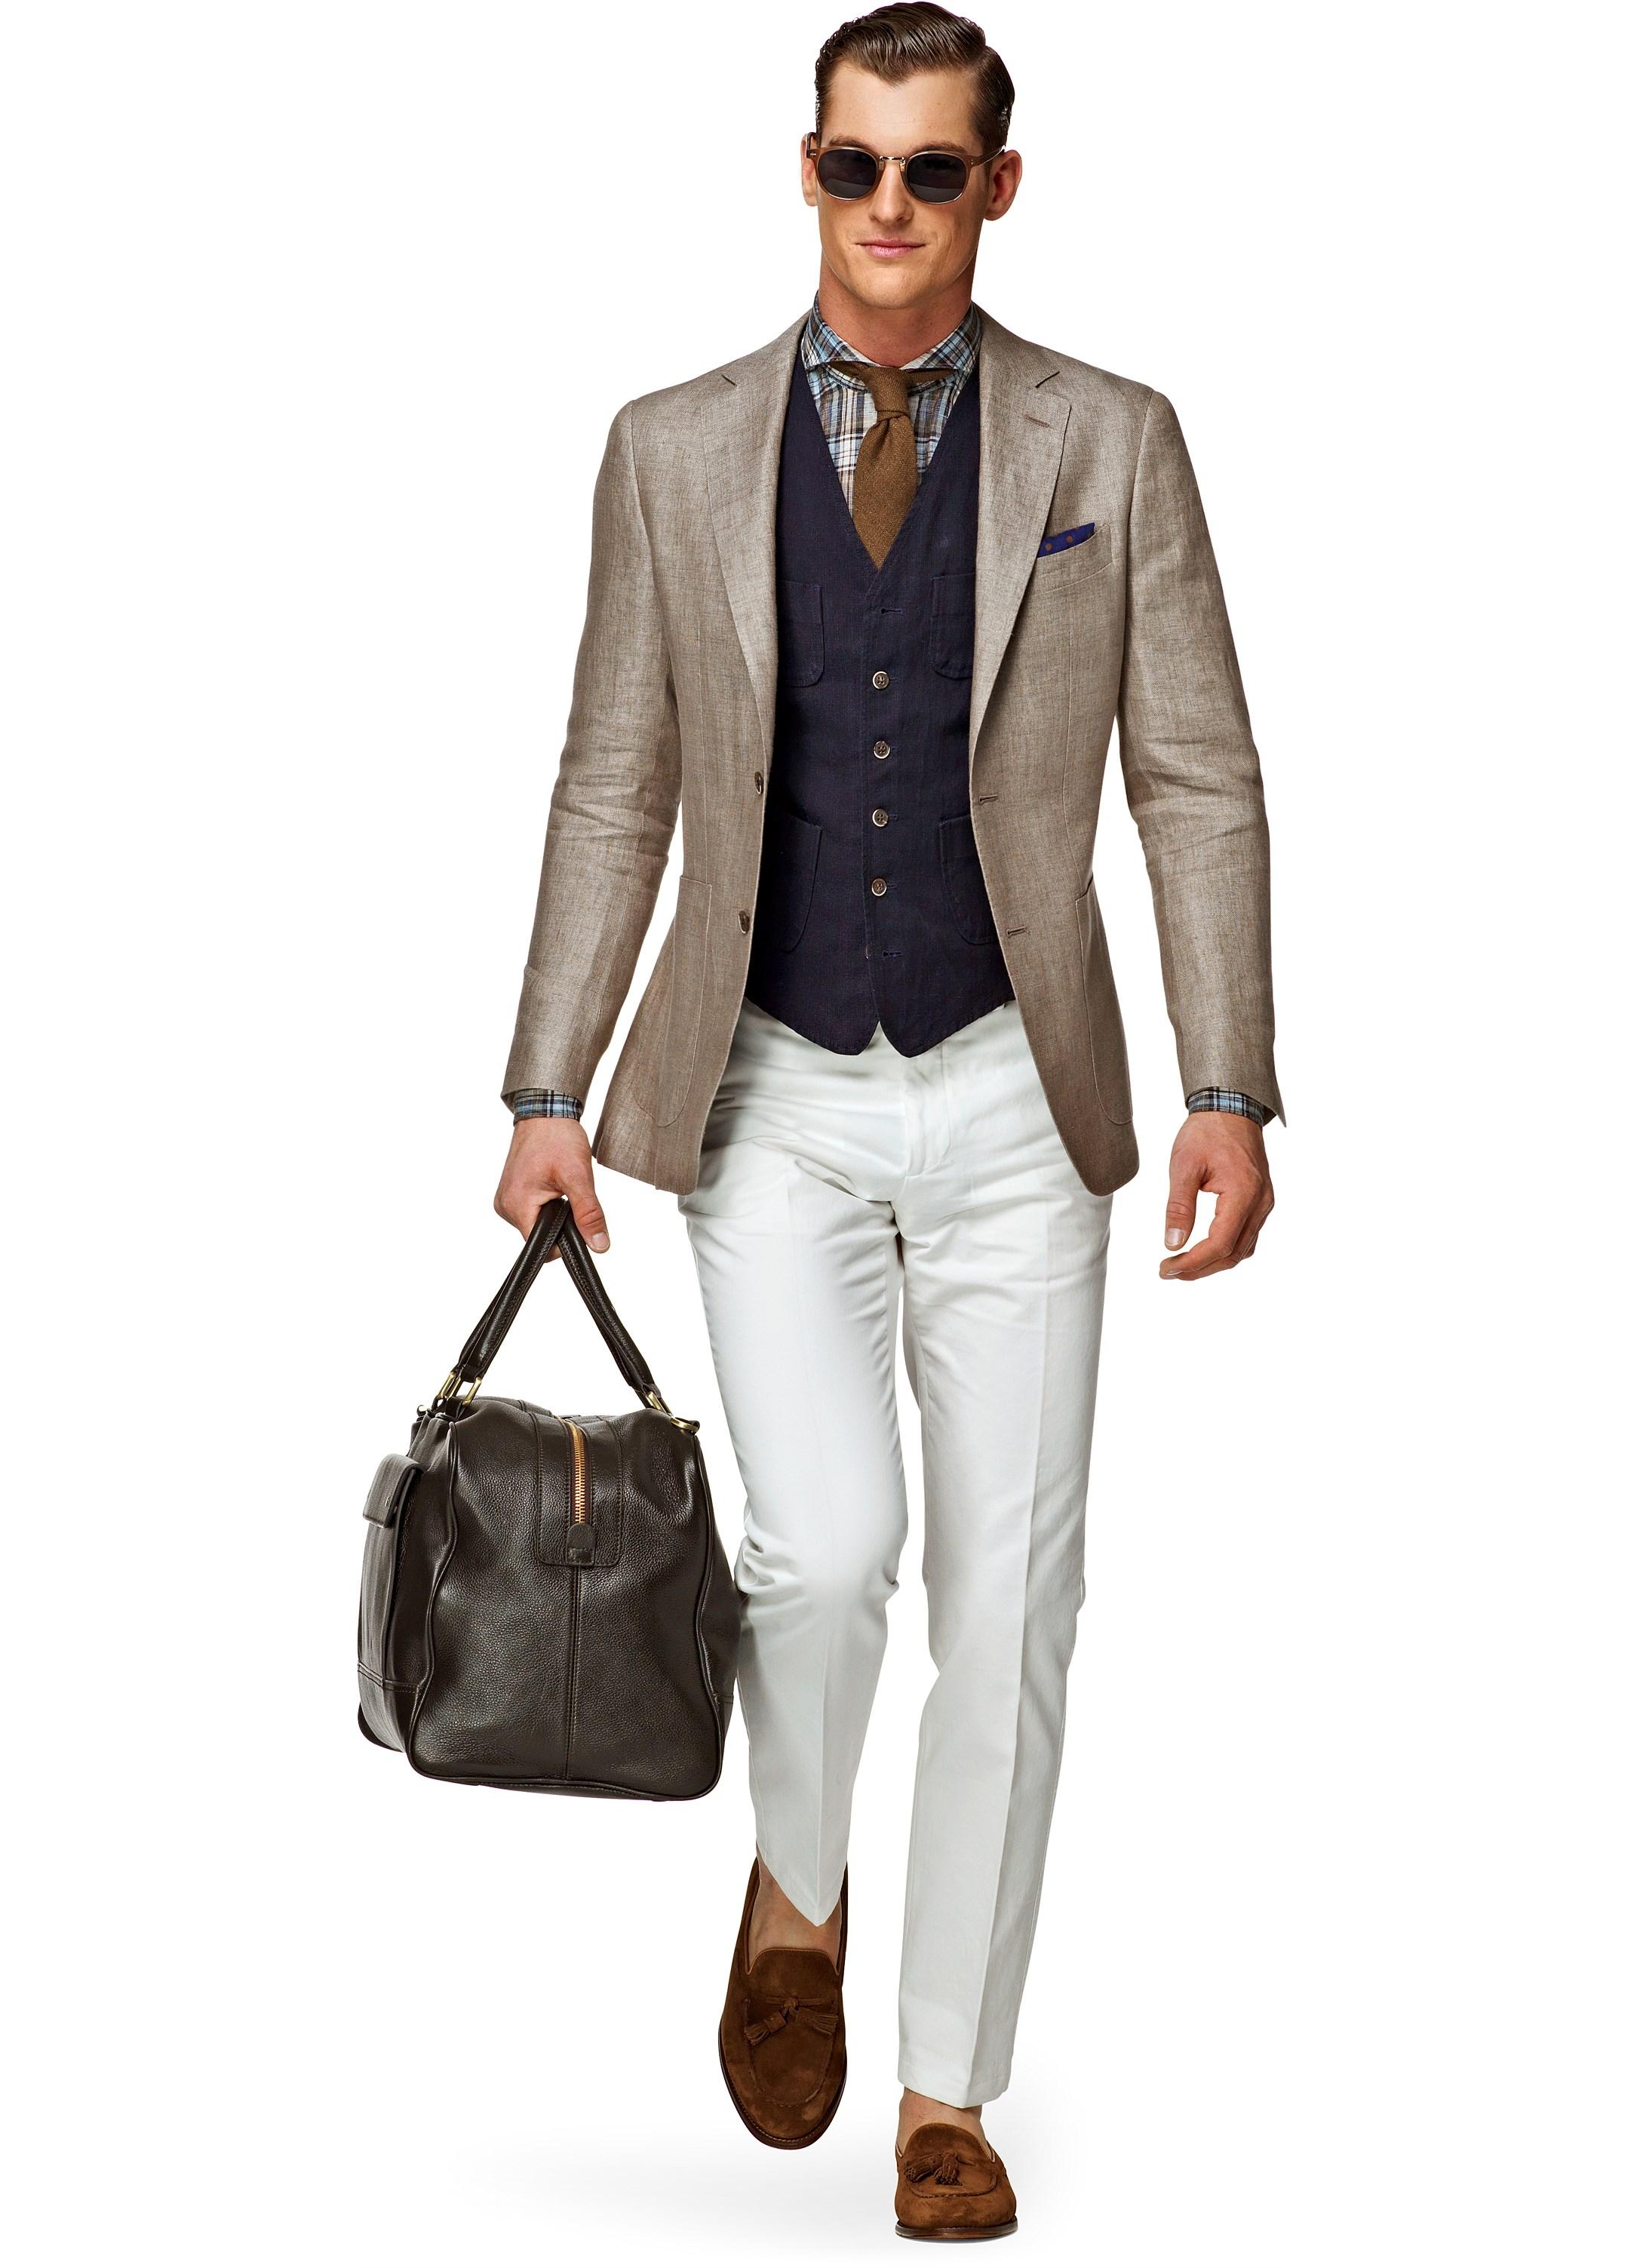 Brown Linen Jacket - JacketIn